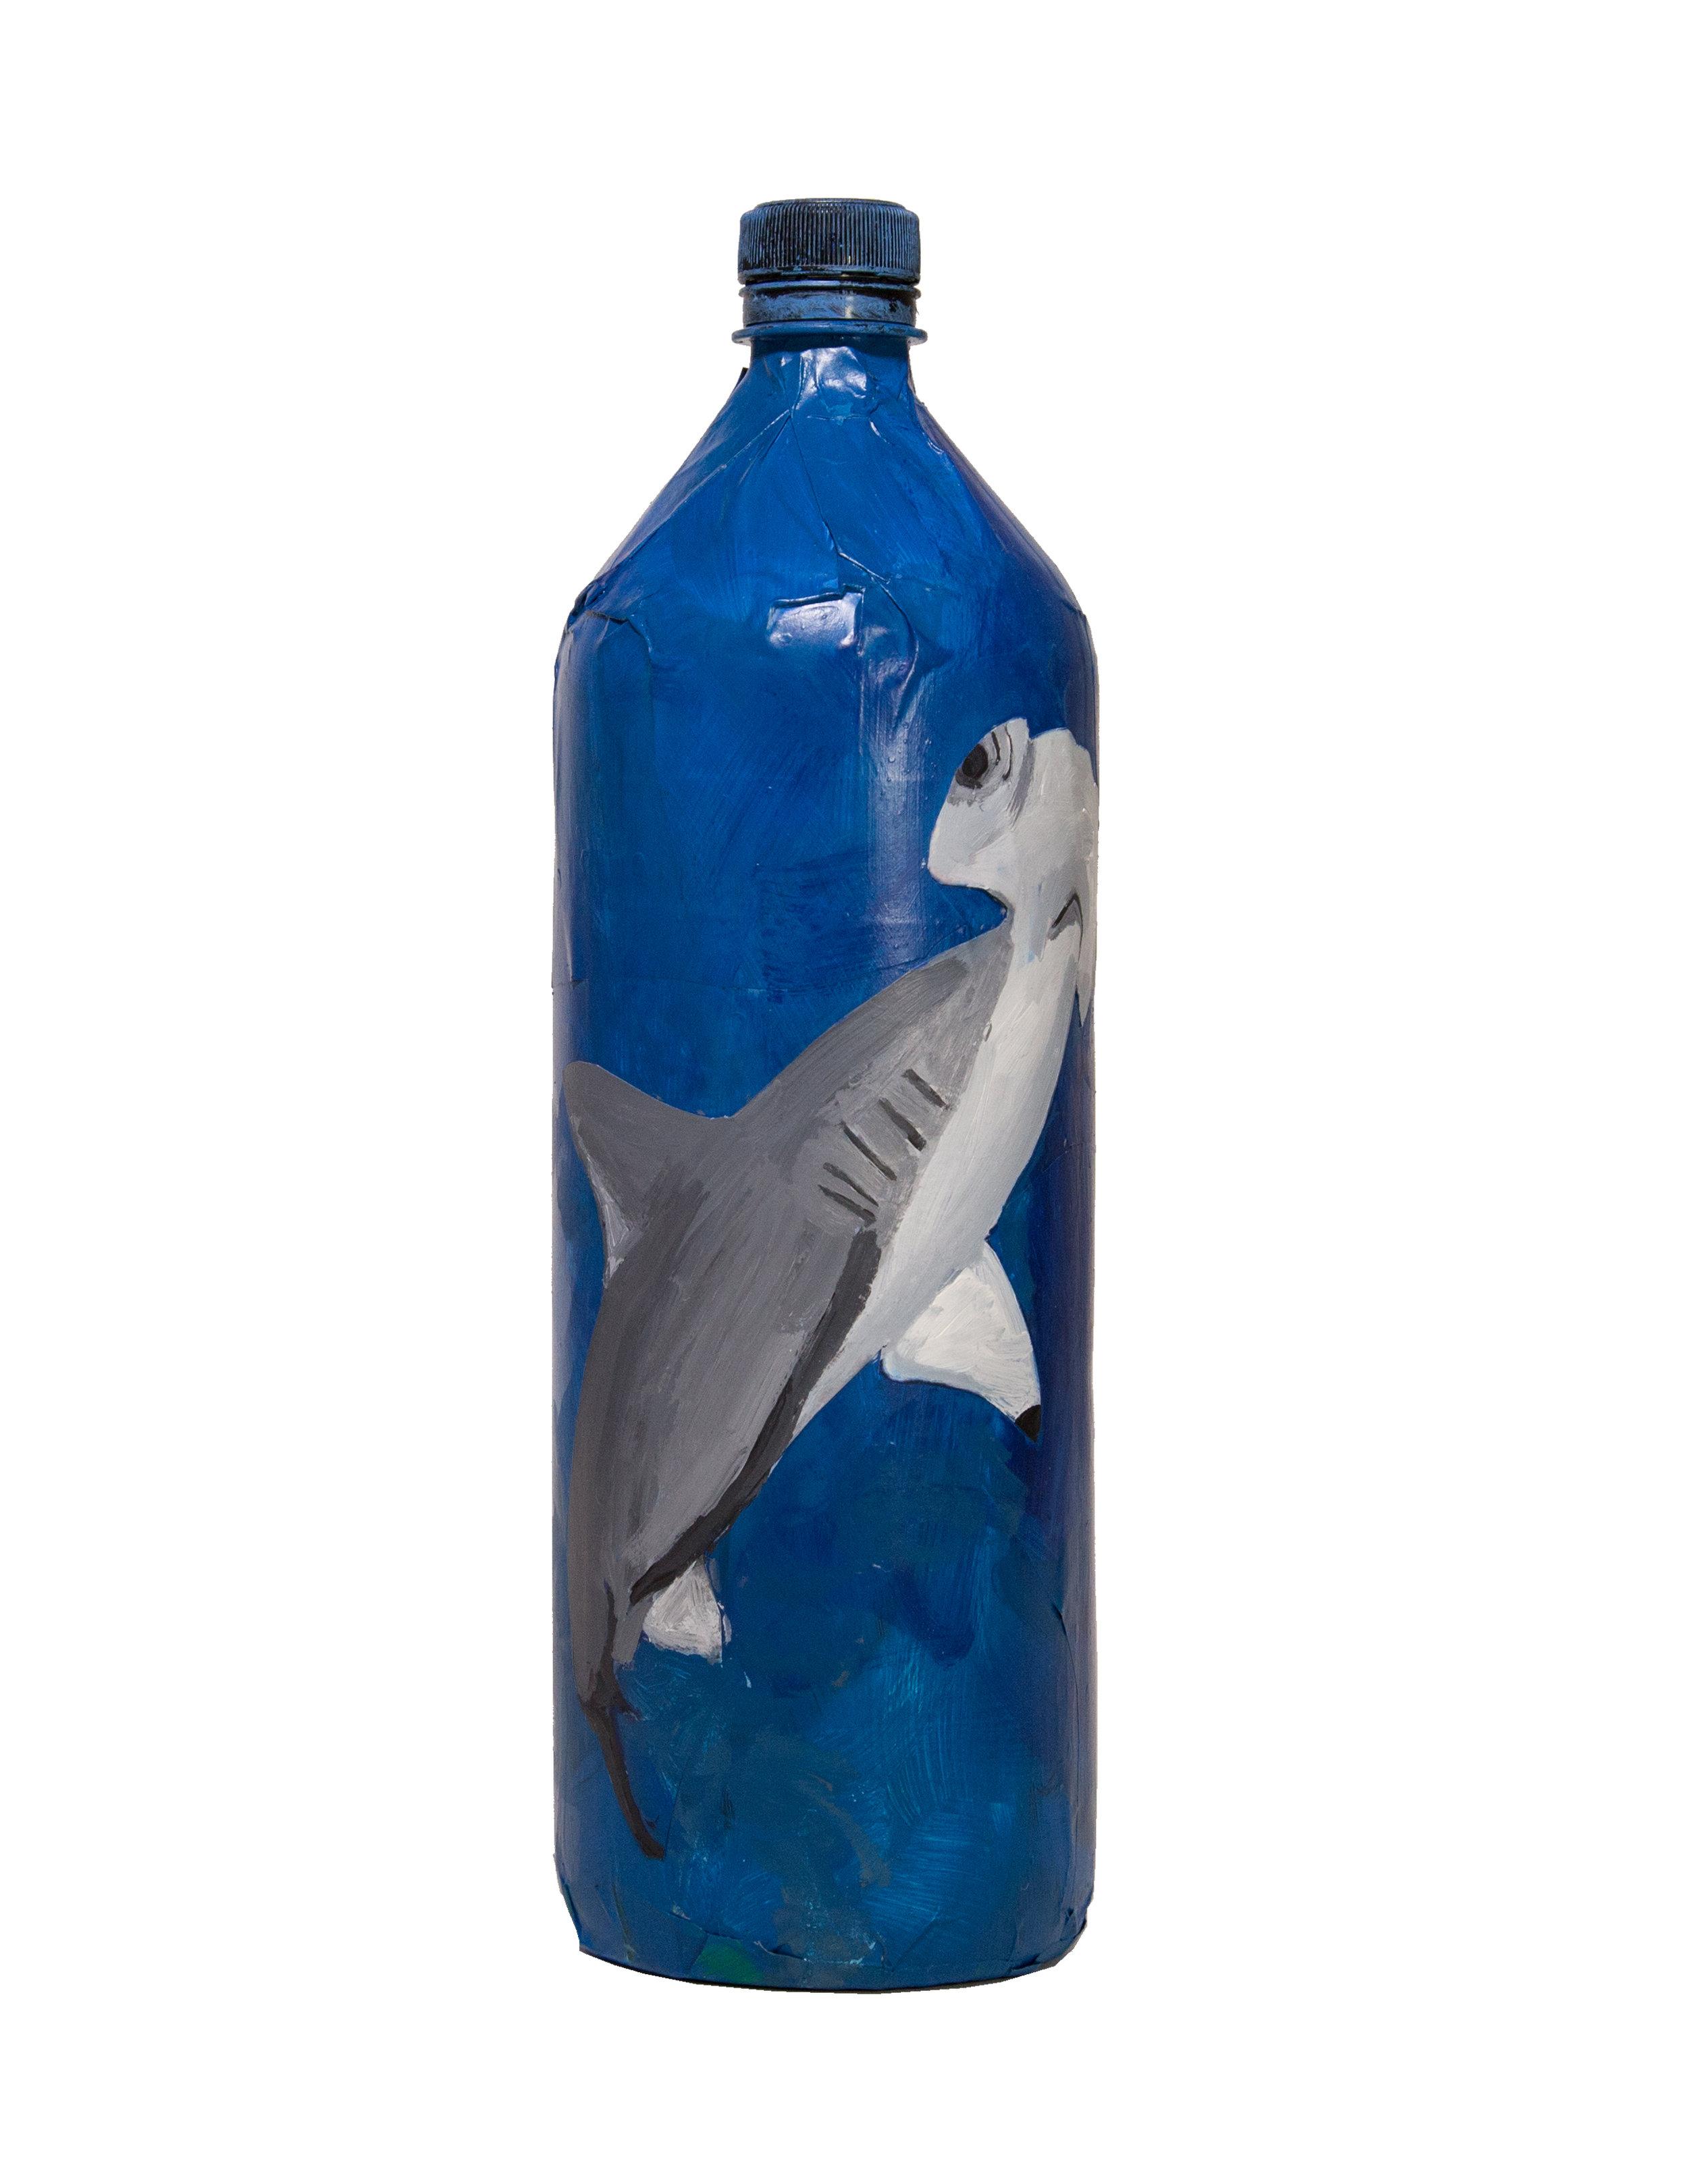 NEW Black Pete Swordfish Custom Pre-made Double Rig from Blue Bottle Marine